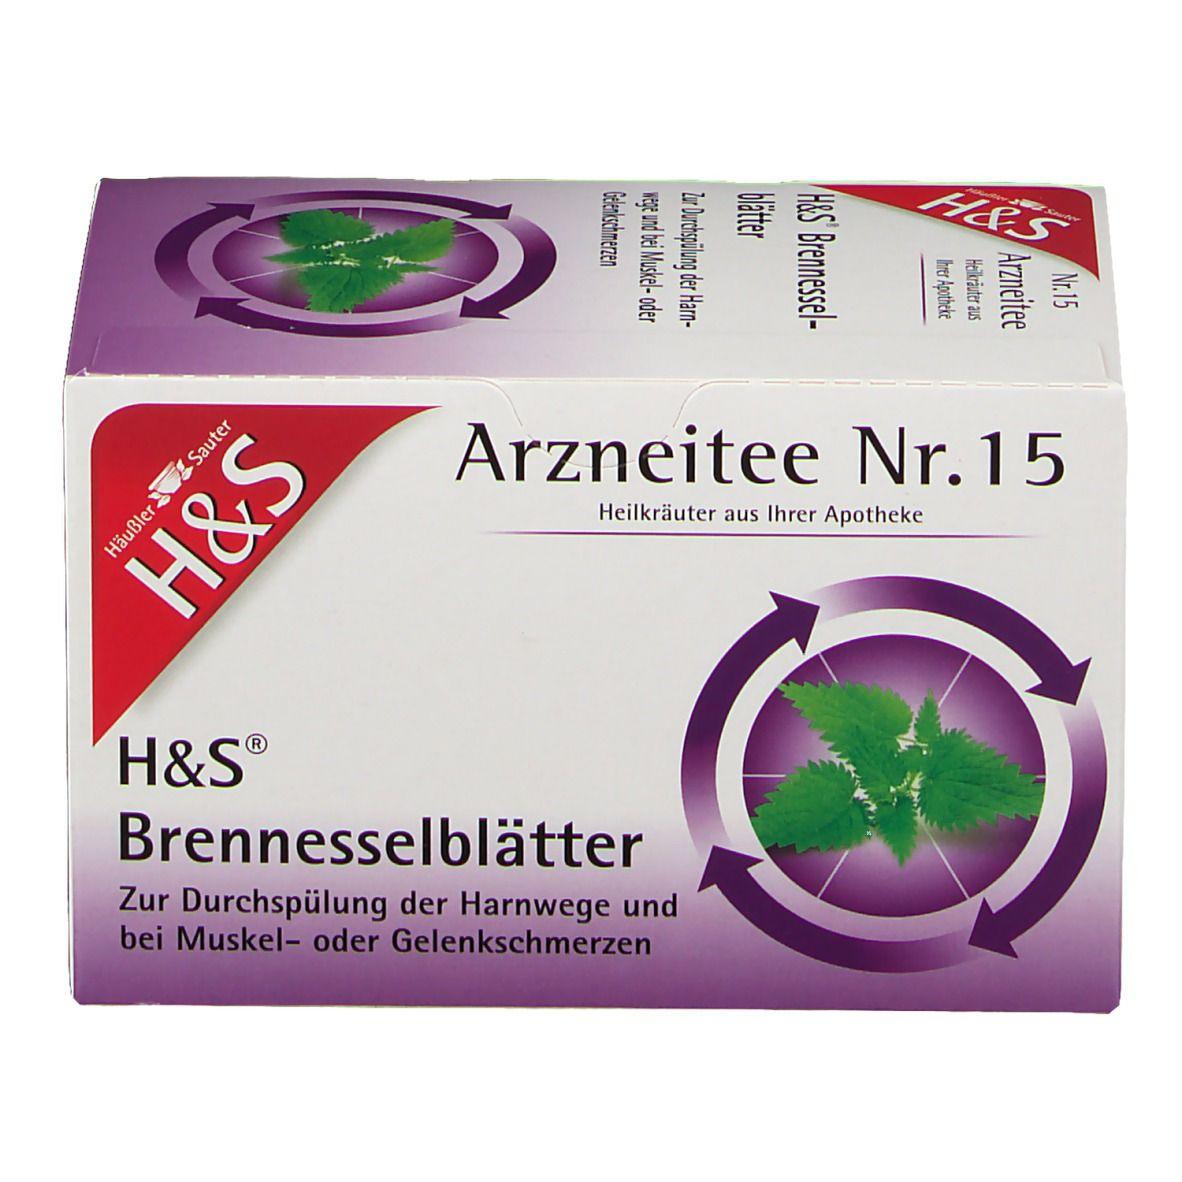 H&S Brennesselkraut Nr. 15